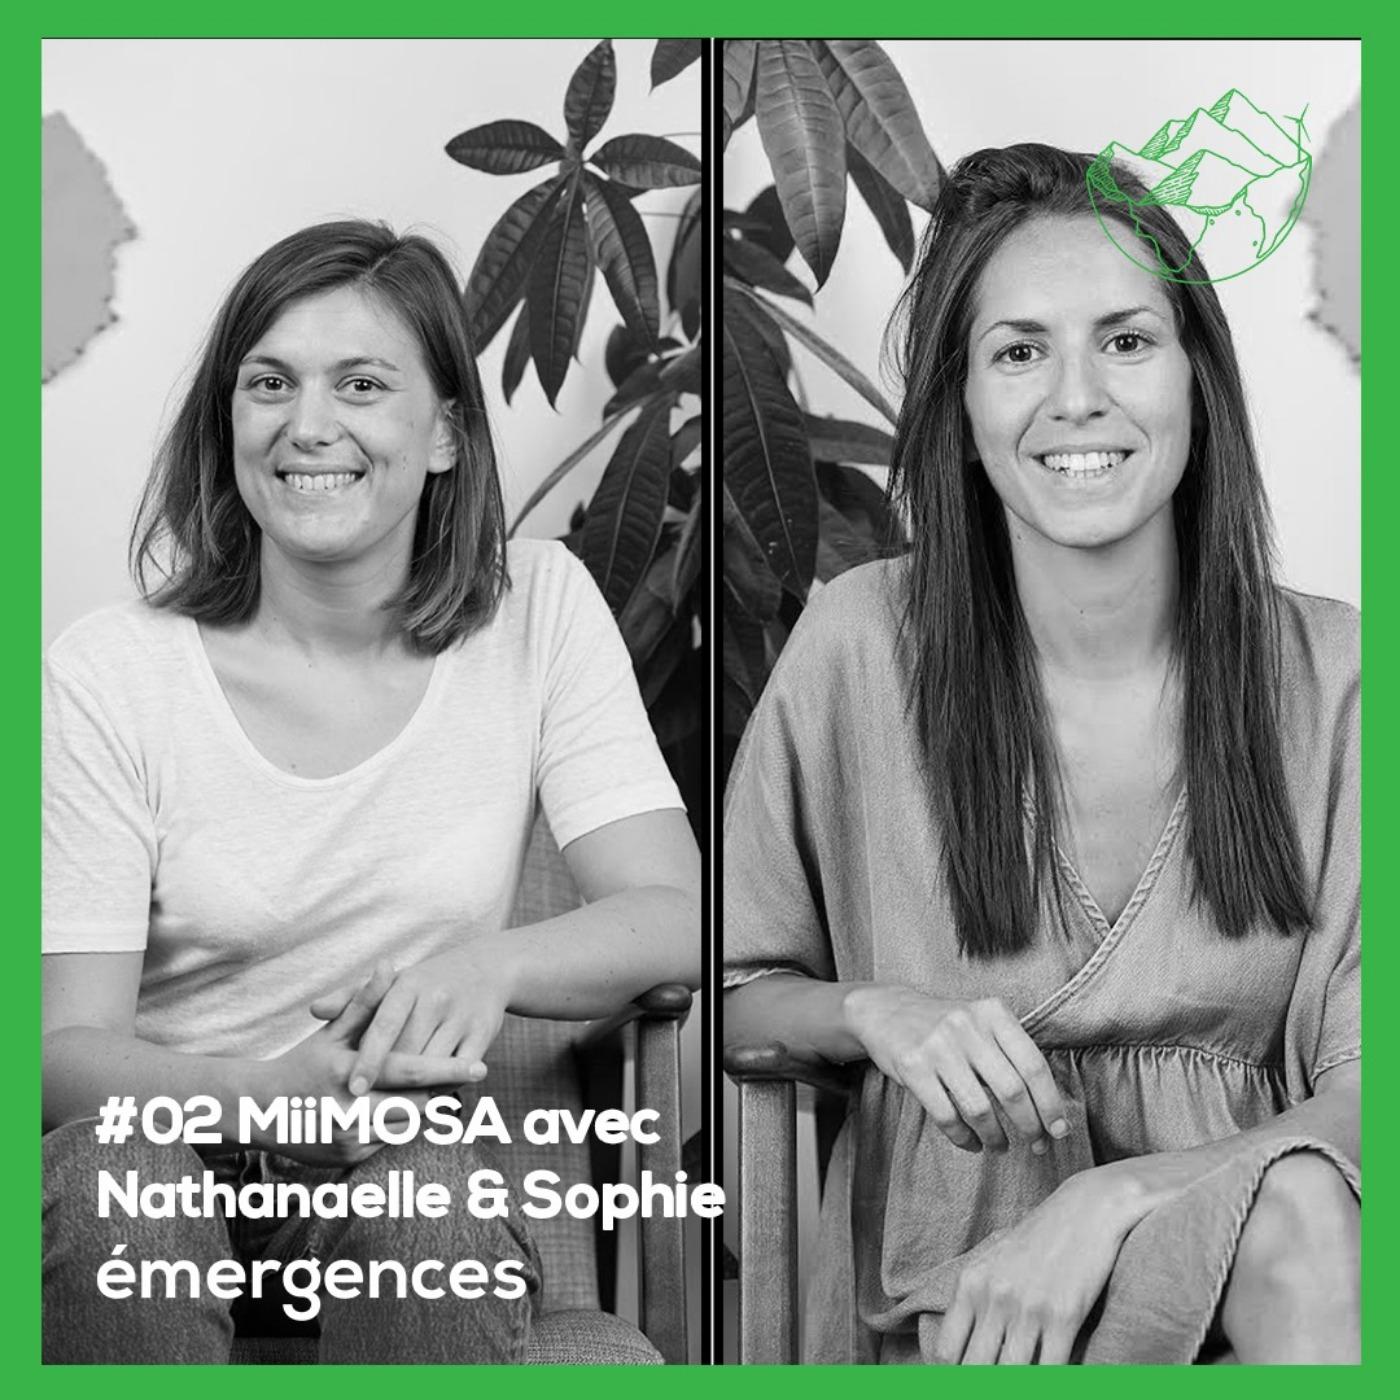 Emergences#02 - Nathanaelle et Sophie - MiiMOSA